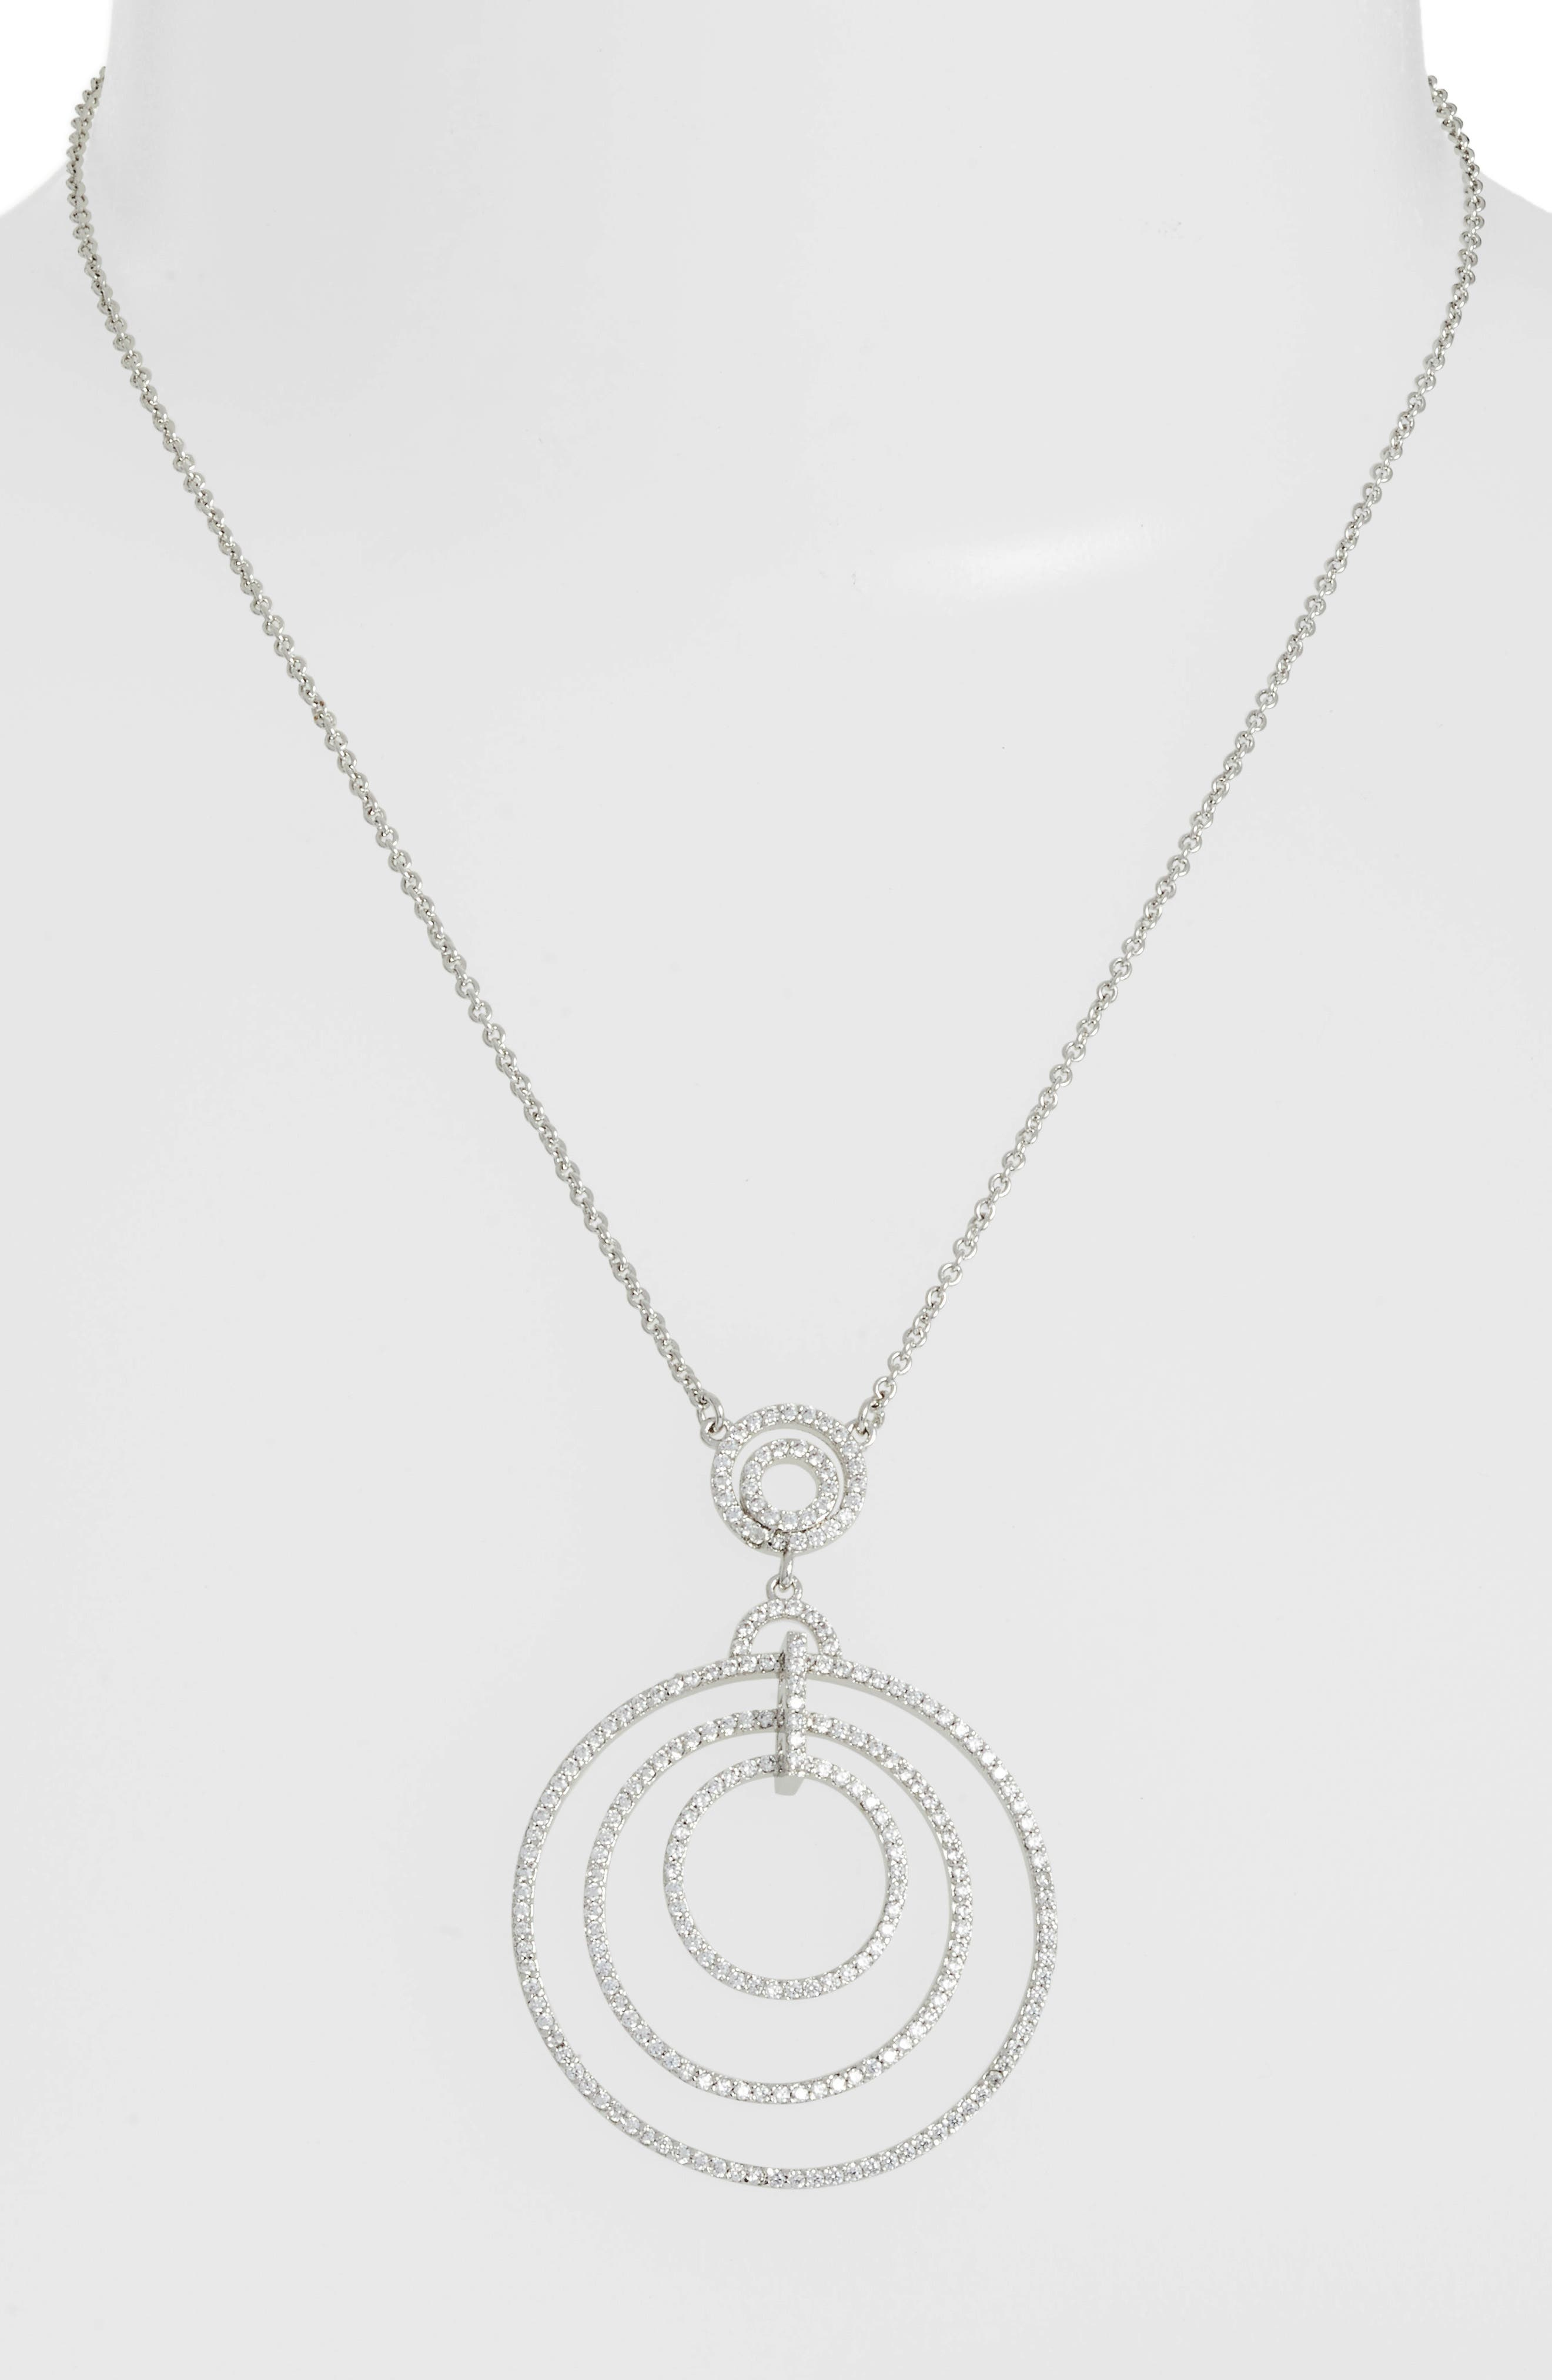 Orbital Pendant Necklace,                             Alternate thumbnail 2, color,                             White/ Silver